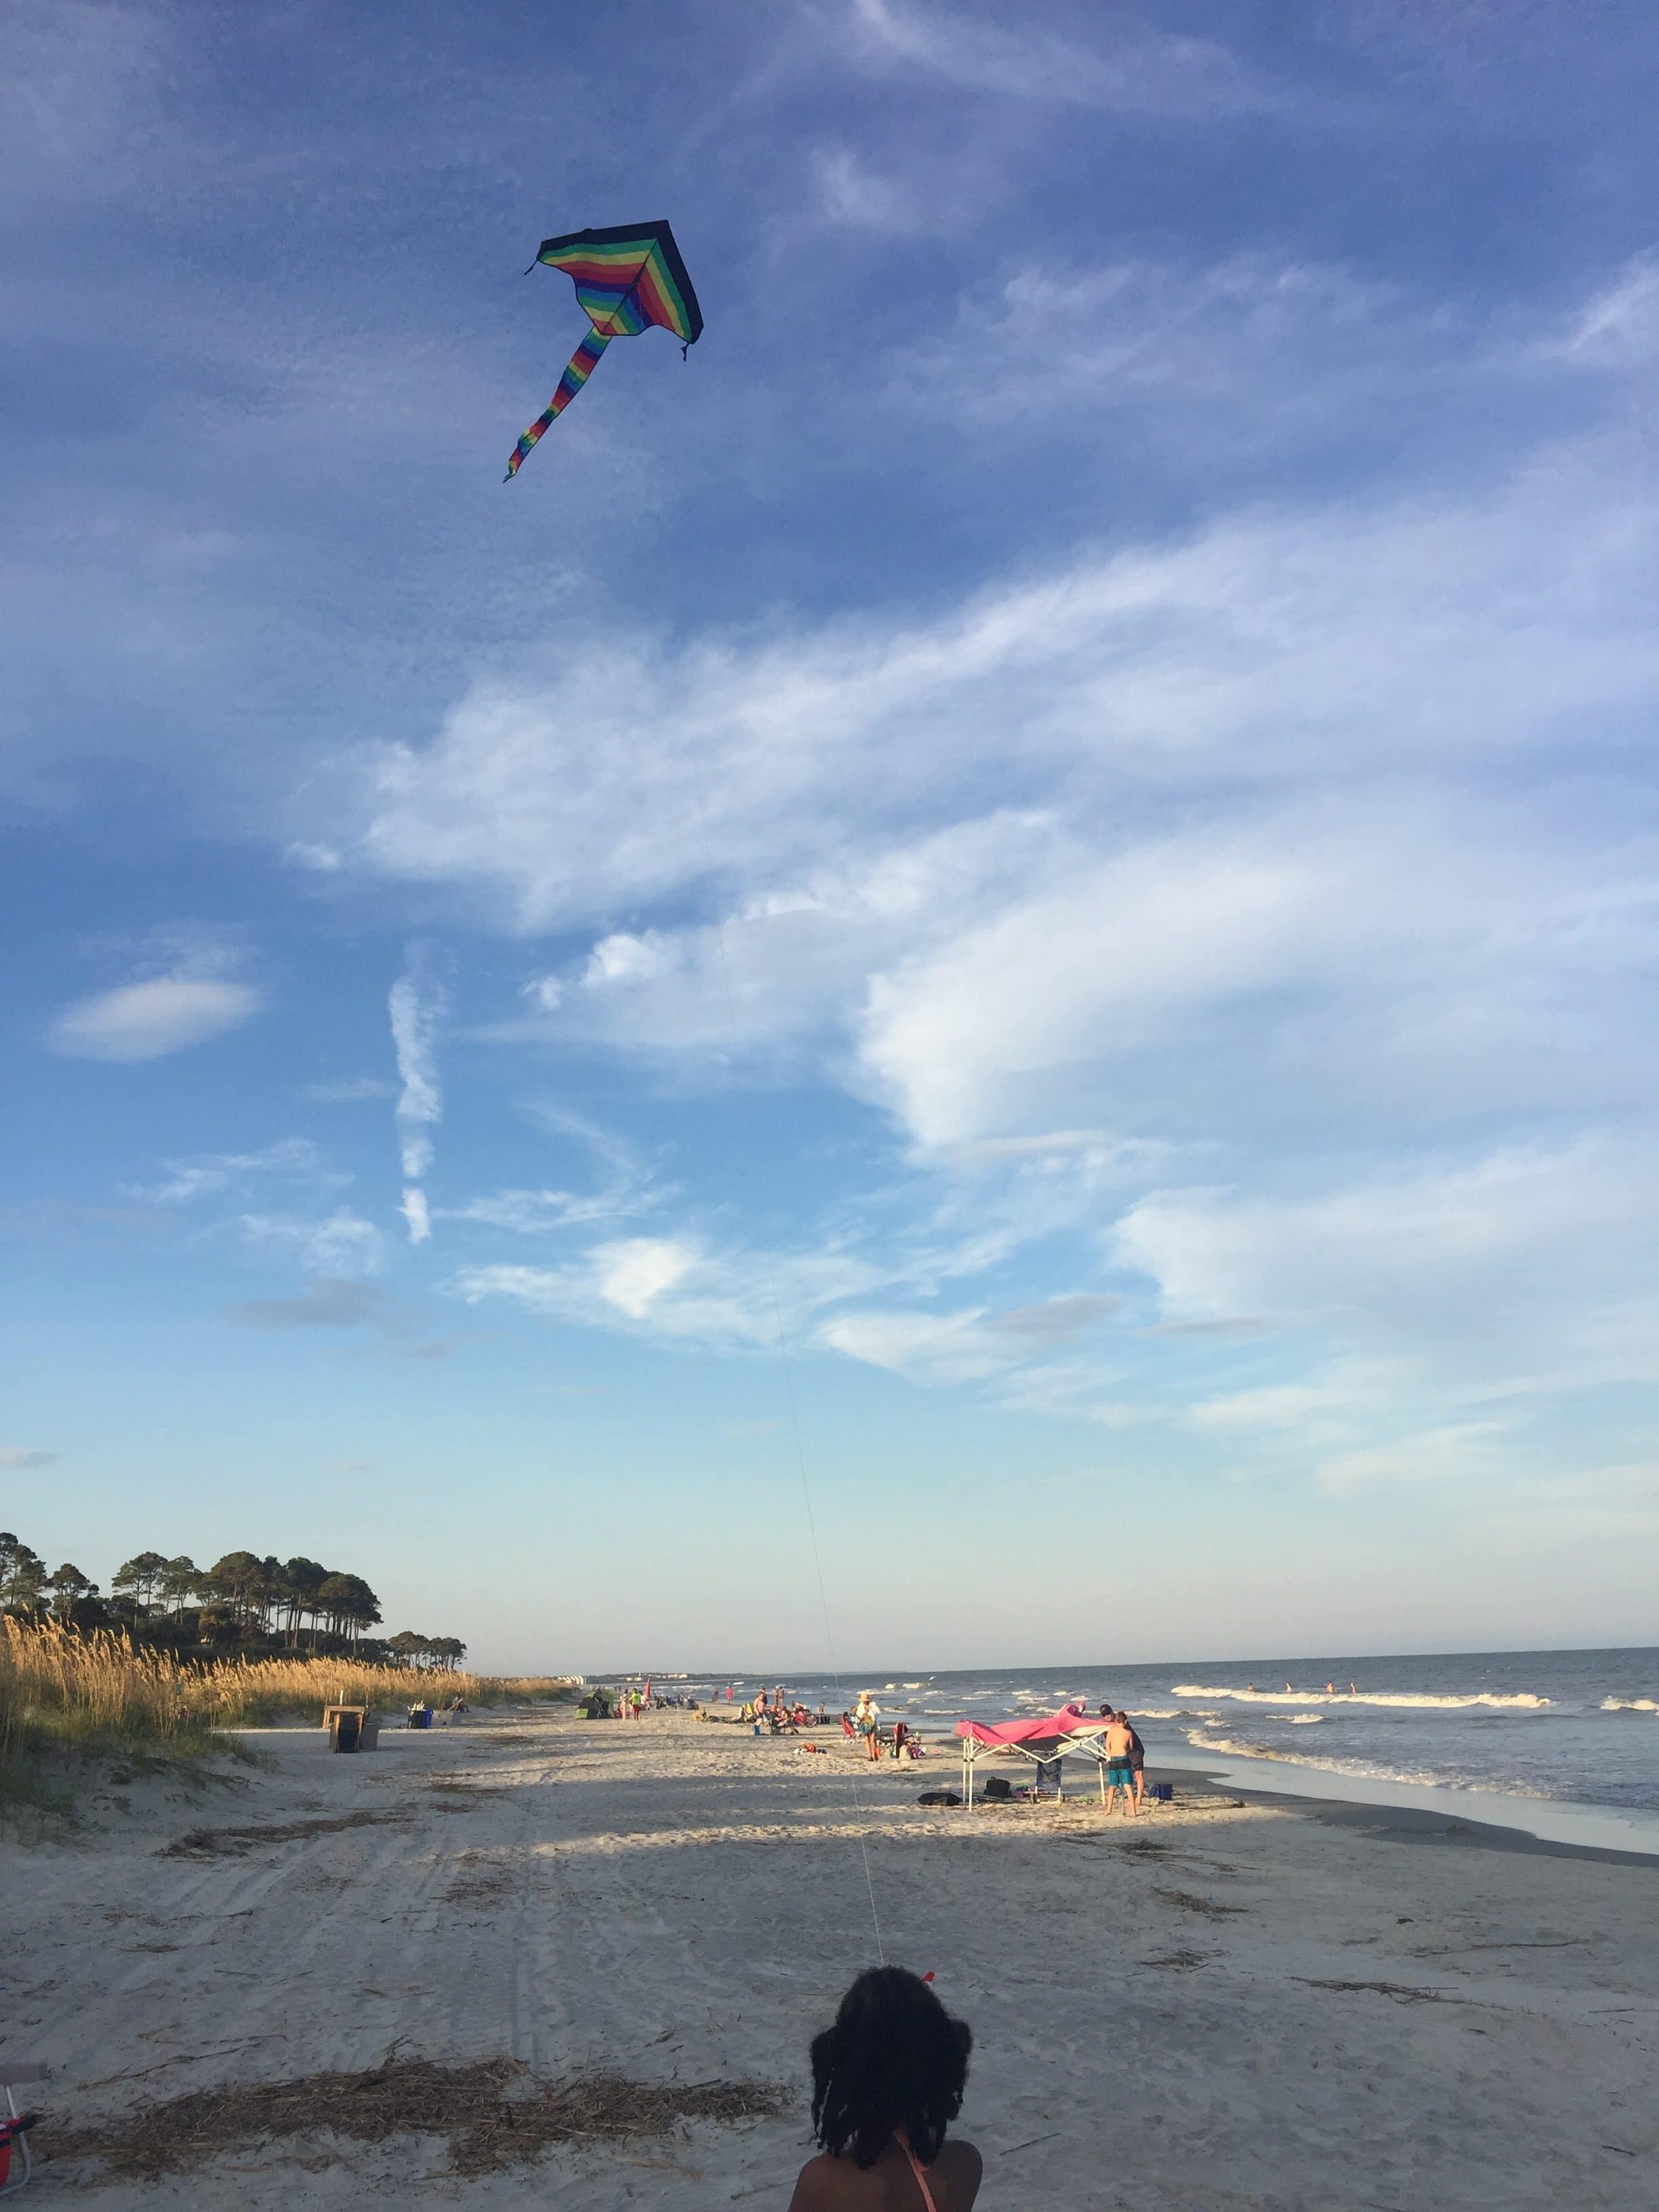 Kite Flying on the Beach in Hilton Head